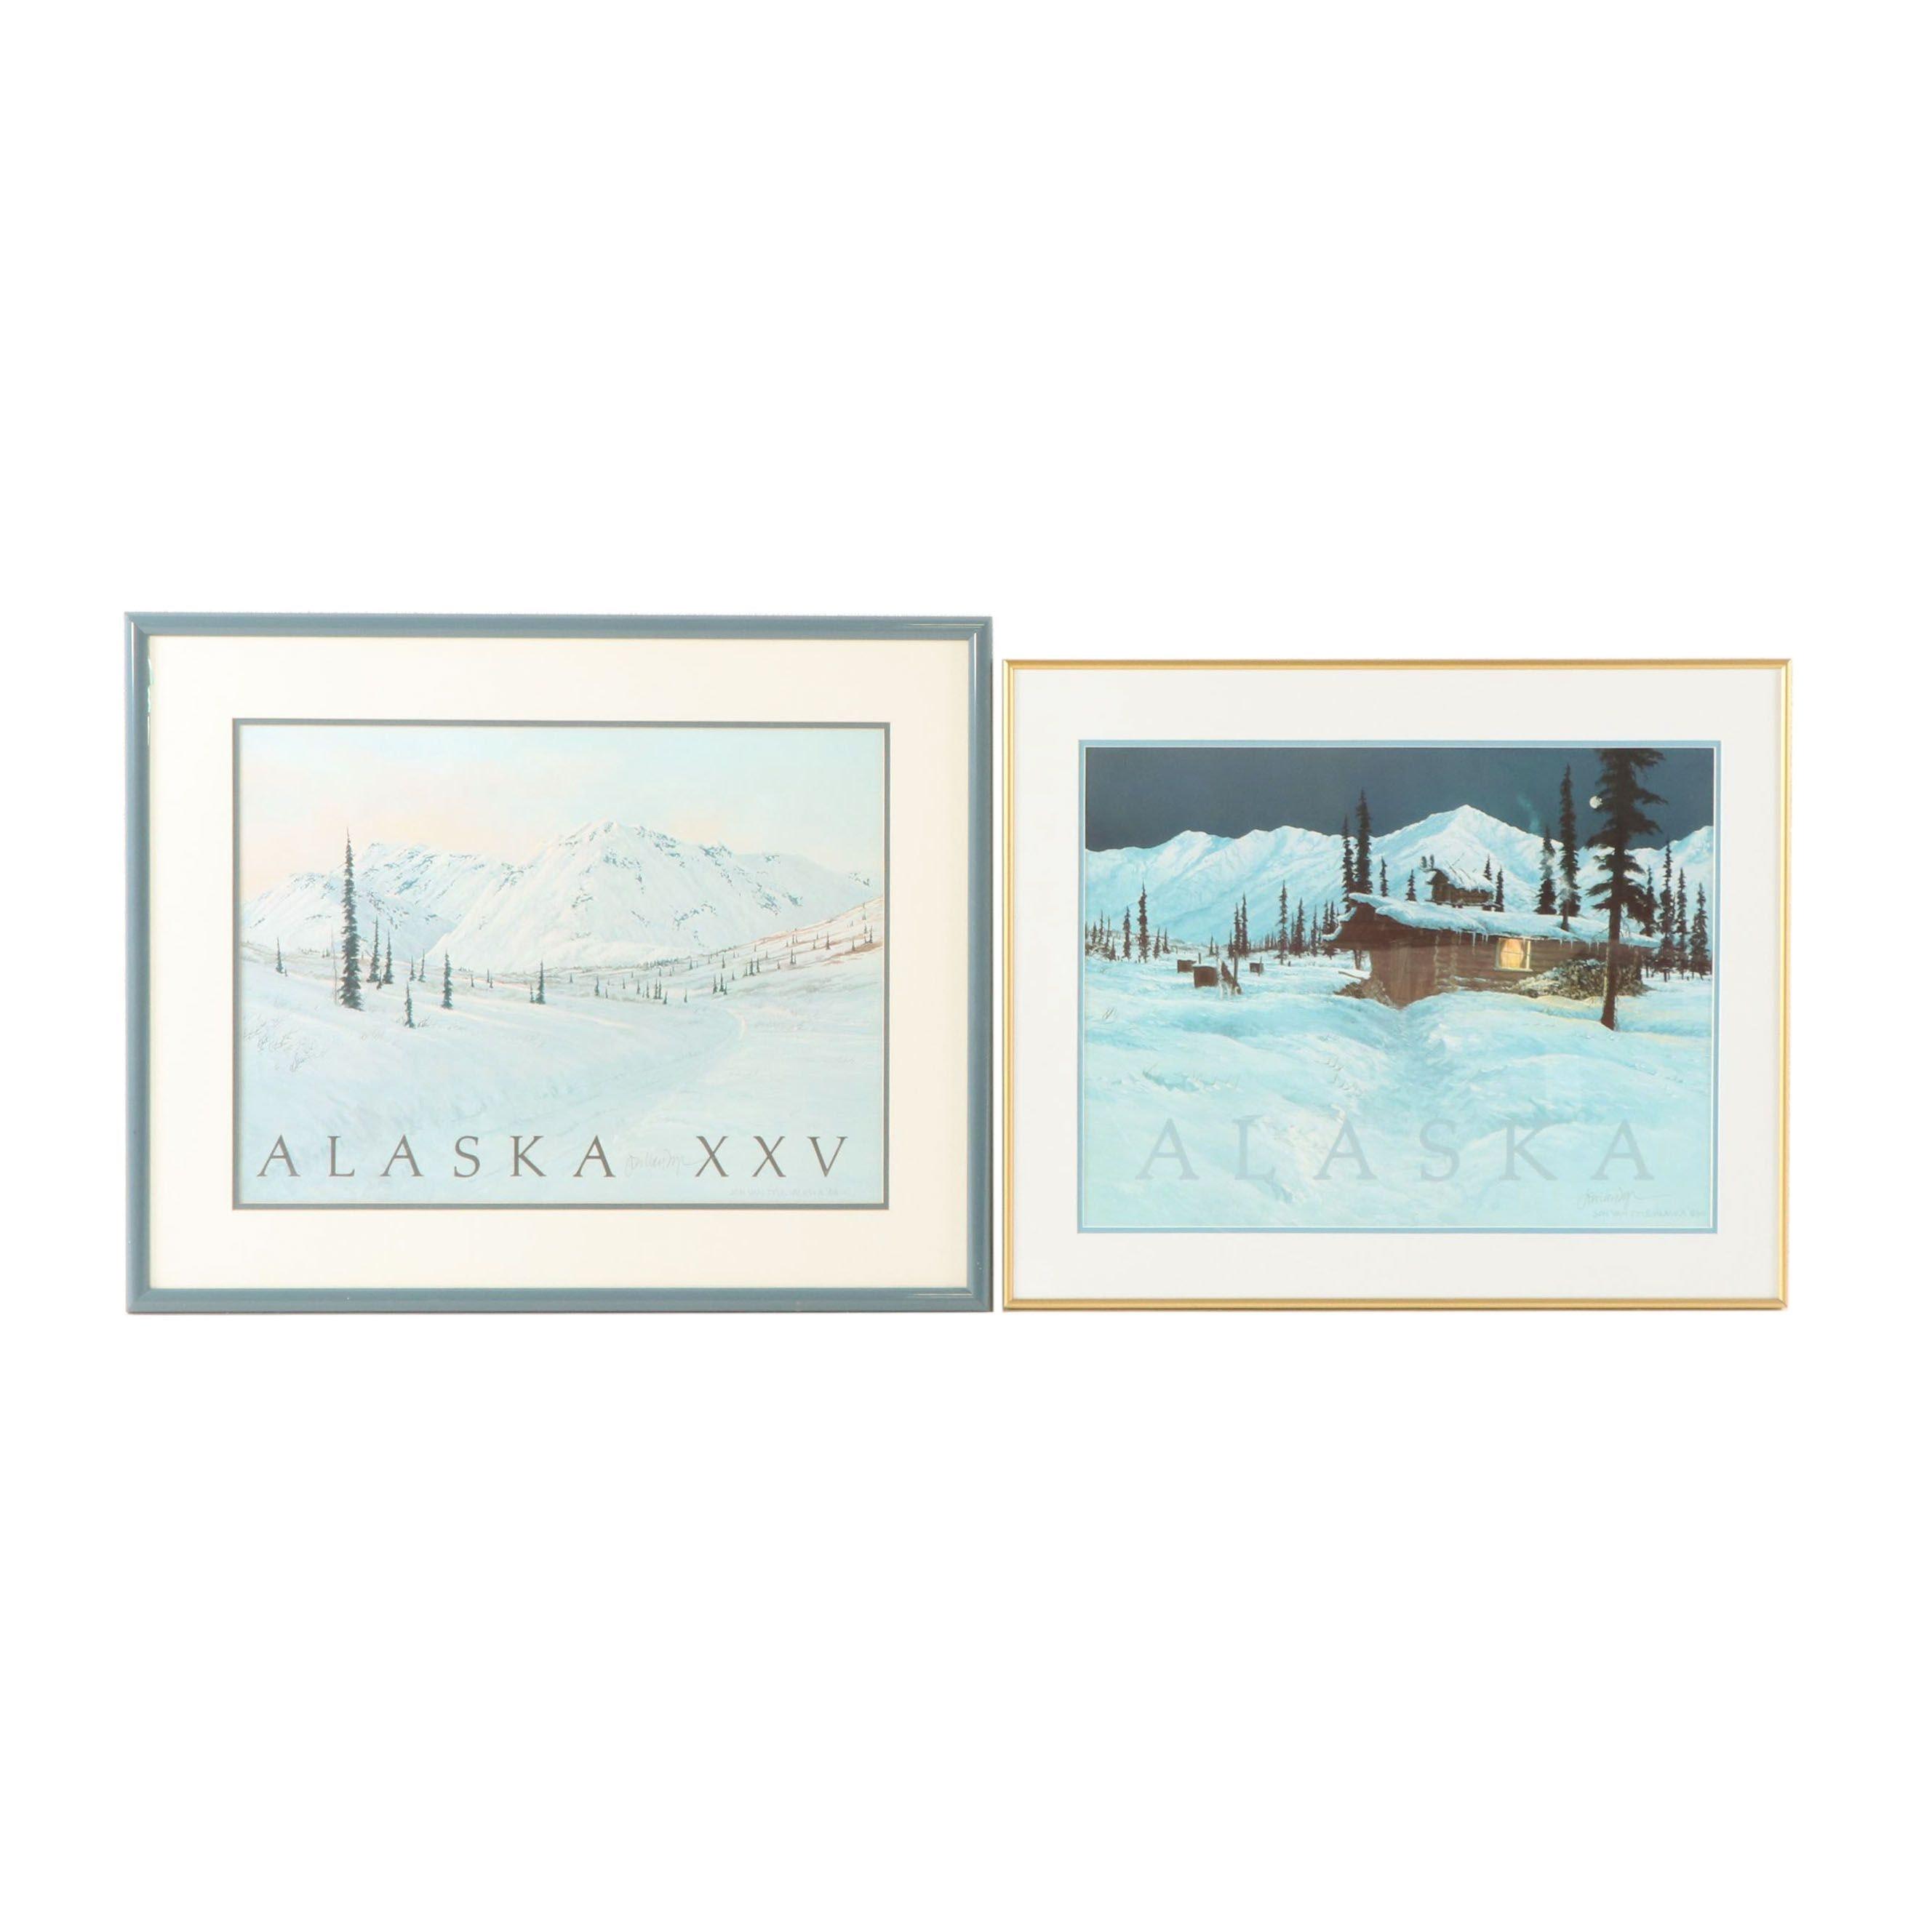 Offset Lithographs of Alaska after Jon Van Zyle